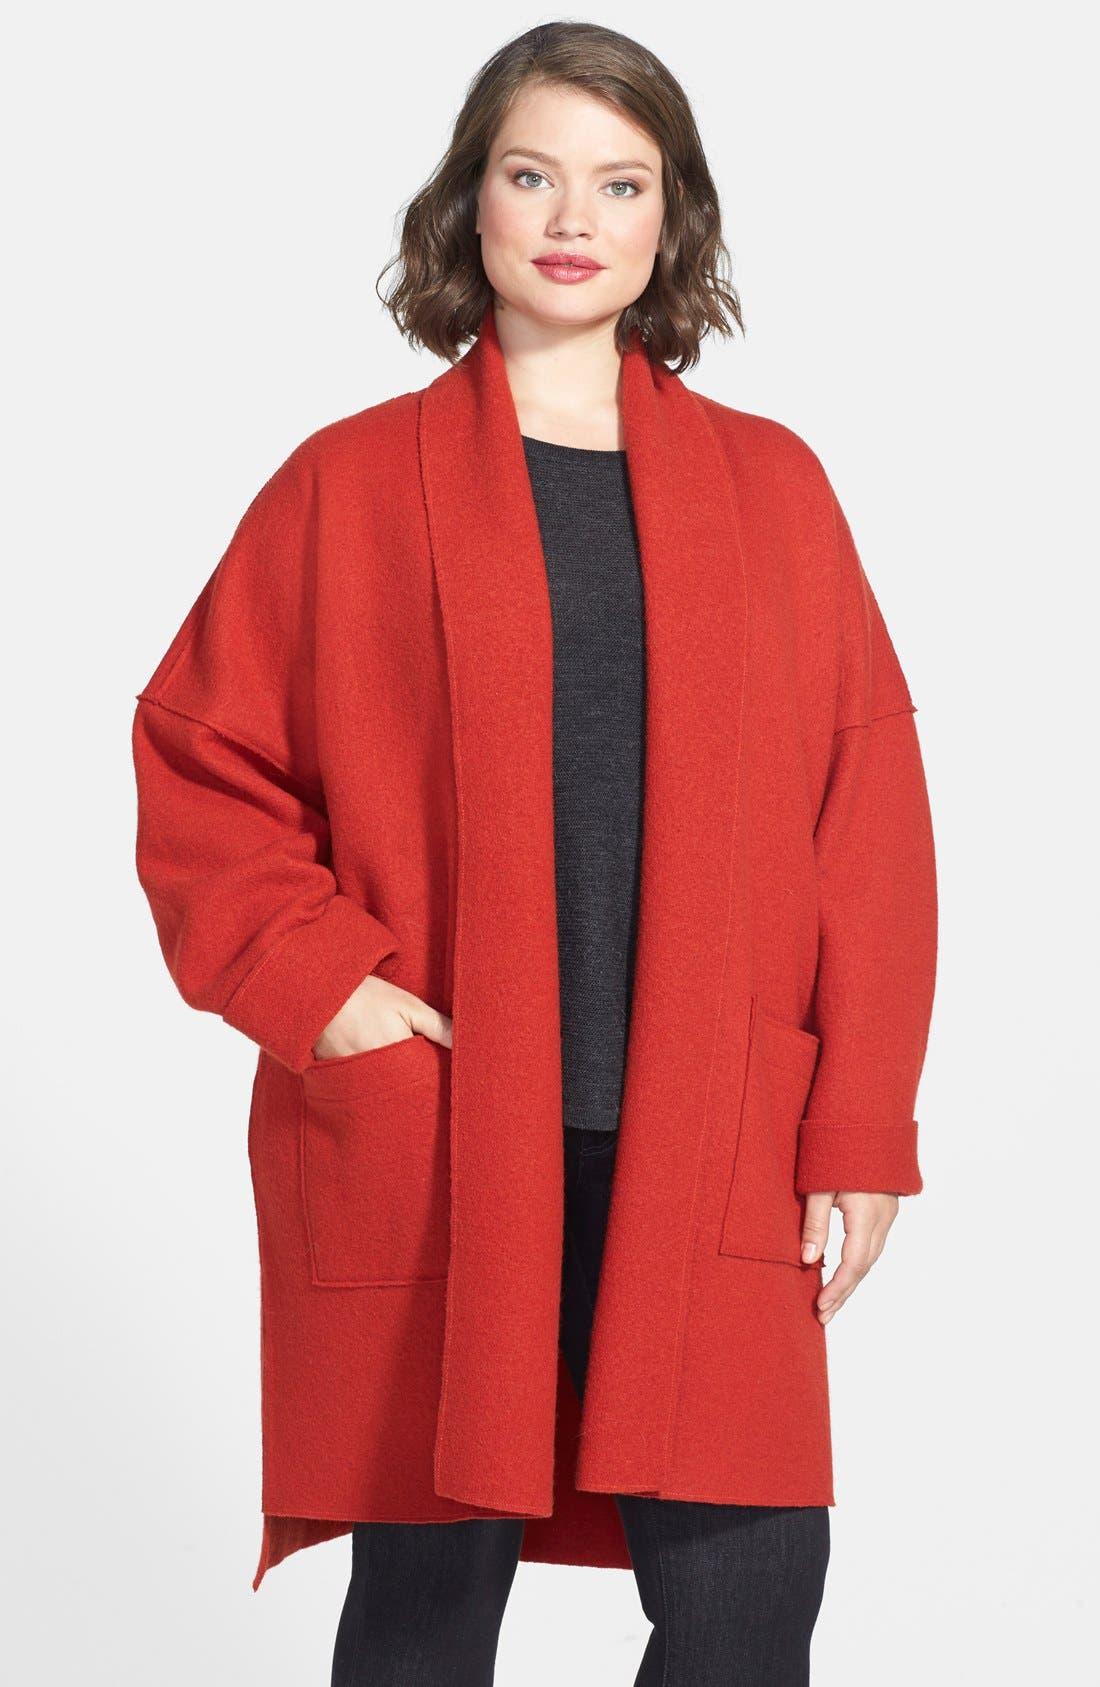 Alternate Image 1 Selected - Eileen Fisher Boiled Wool Kimono Coat (Plus Size)